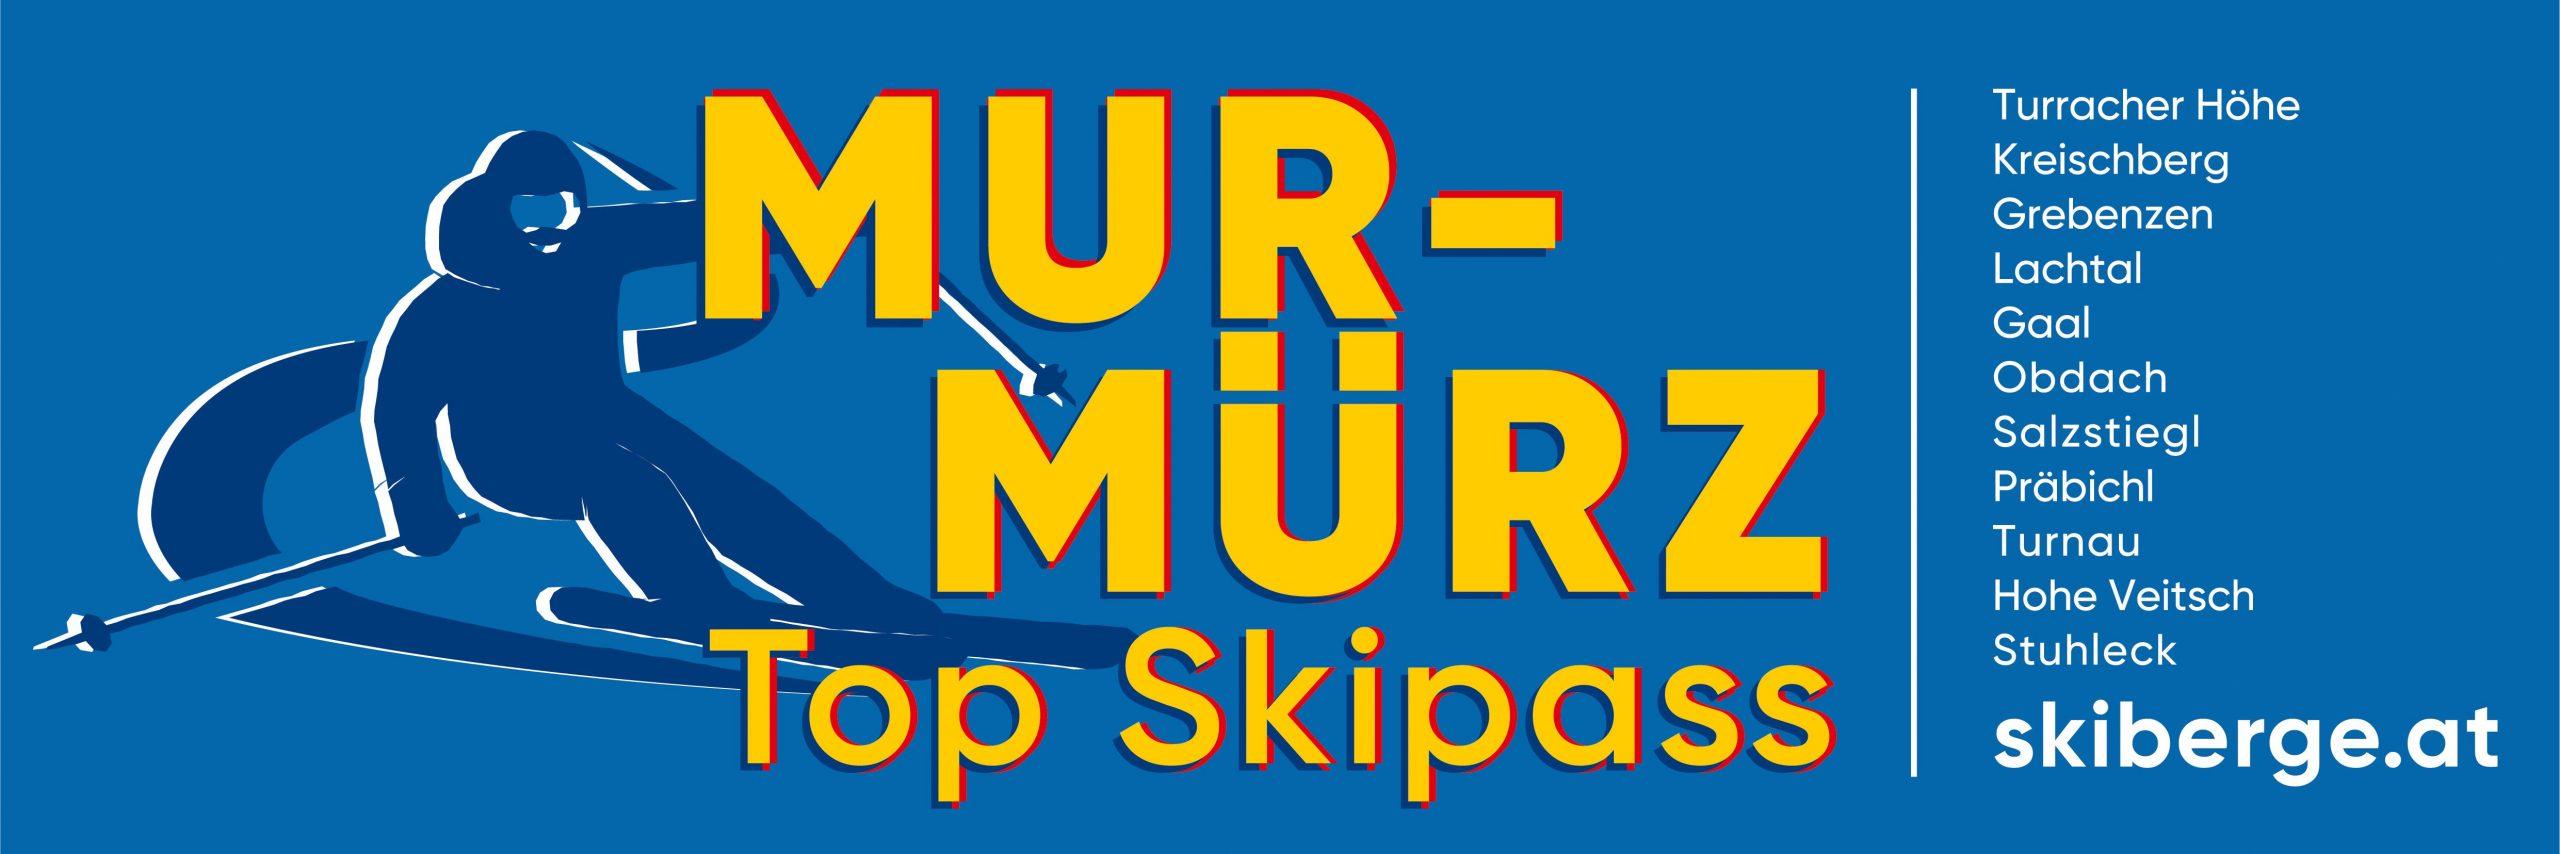 Mur-Mürz Top Skipass